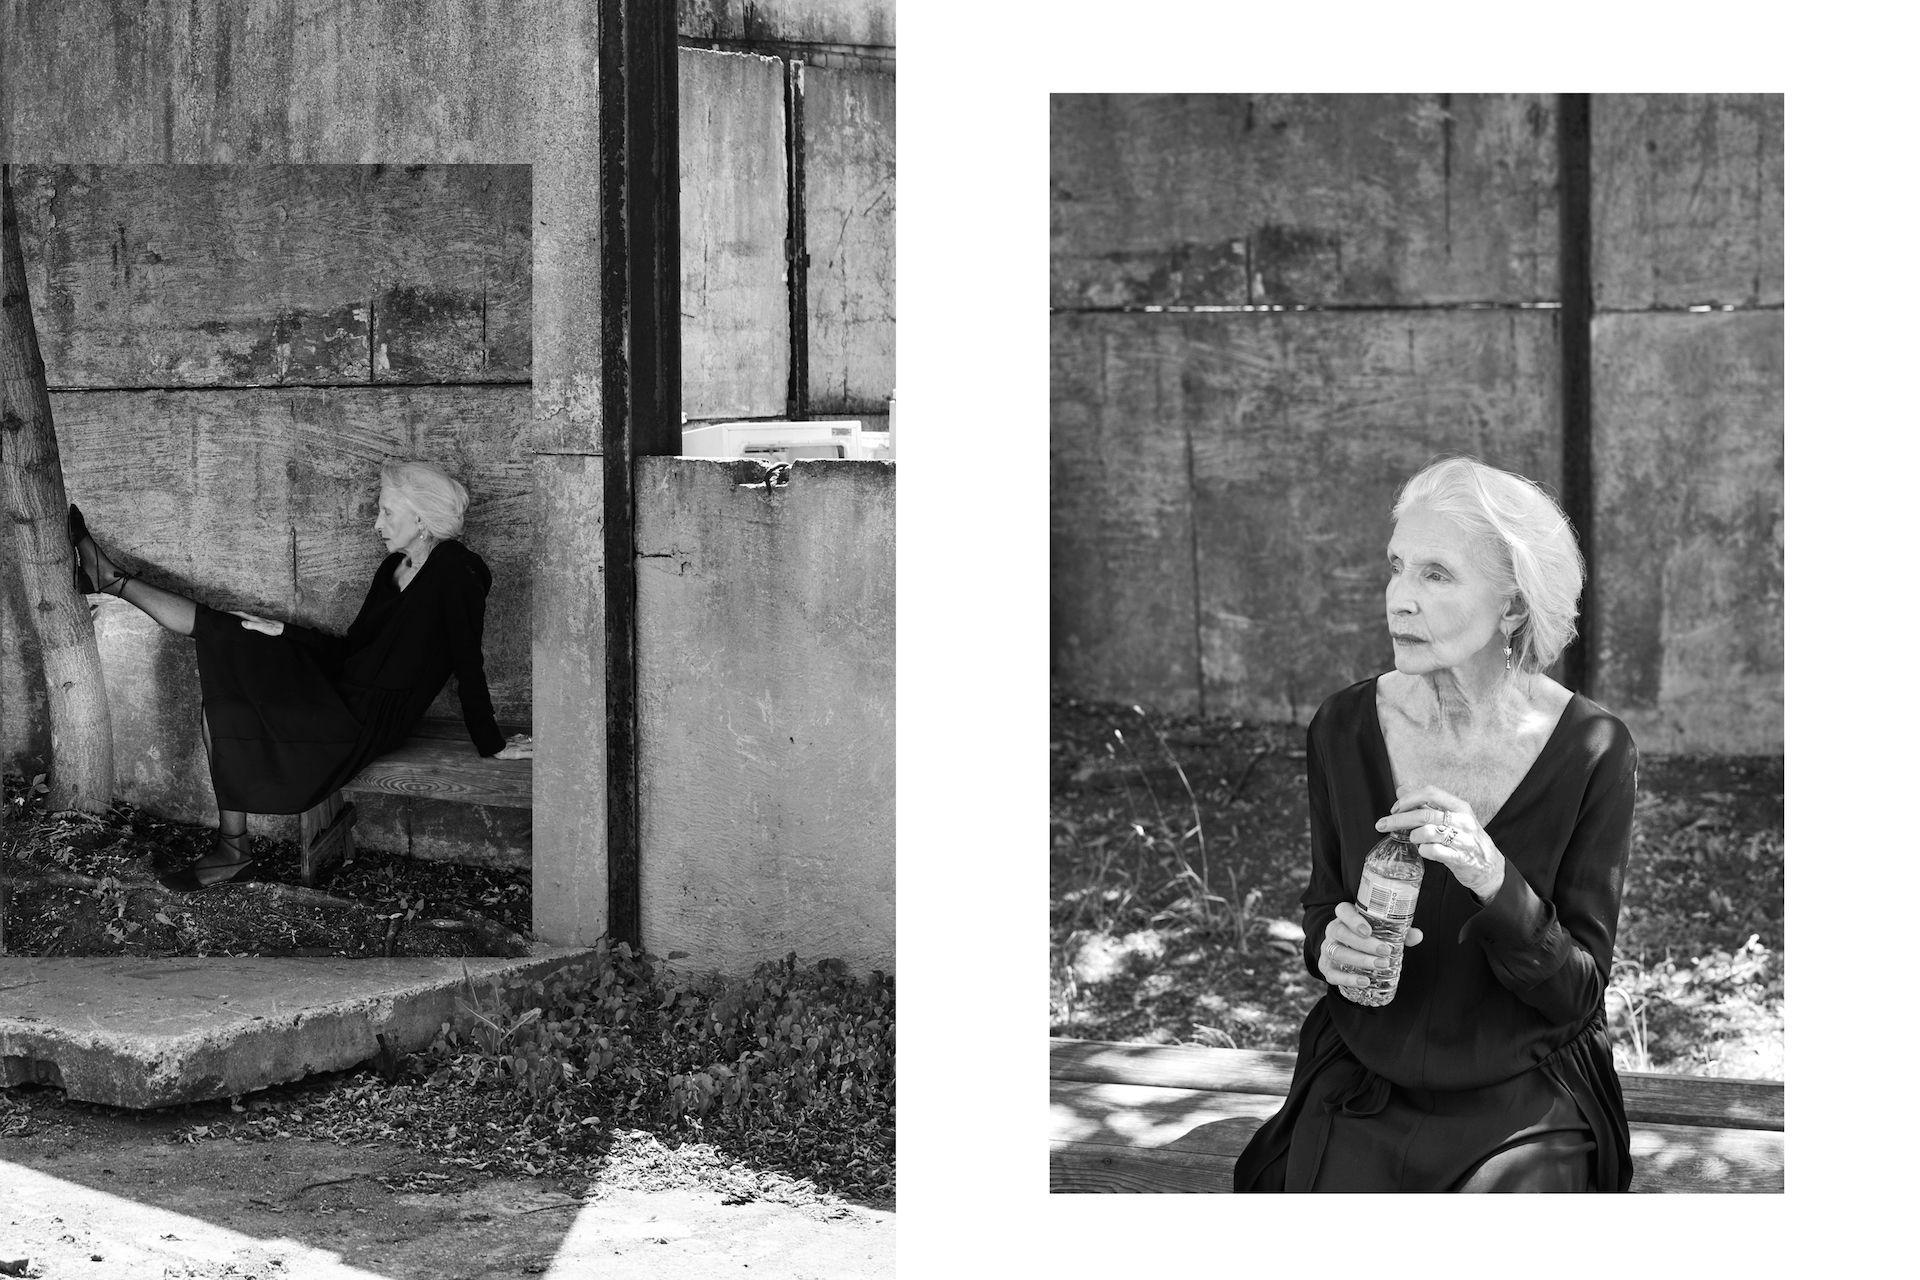 MAGDA WUNSCHE & AGA SAMSEL for SYRENA Theatre